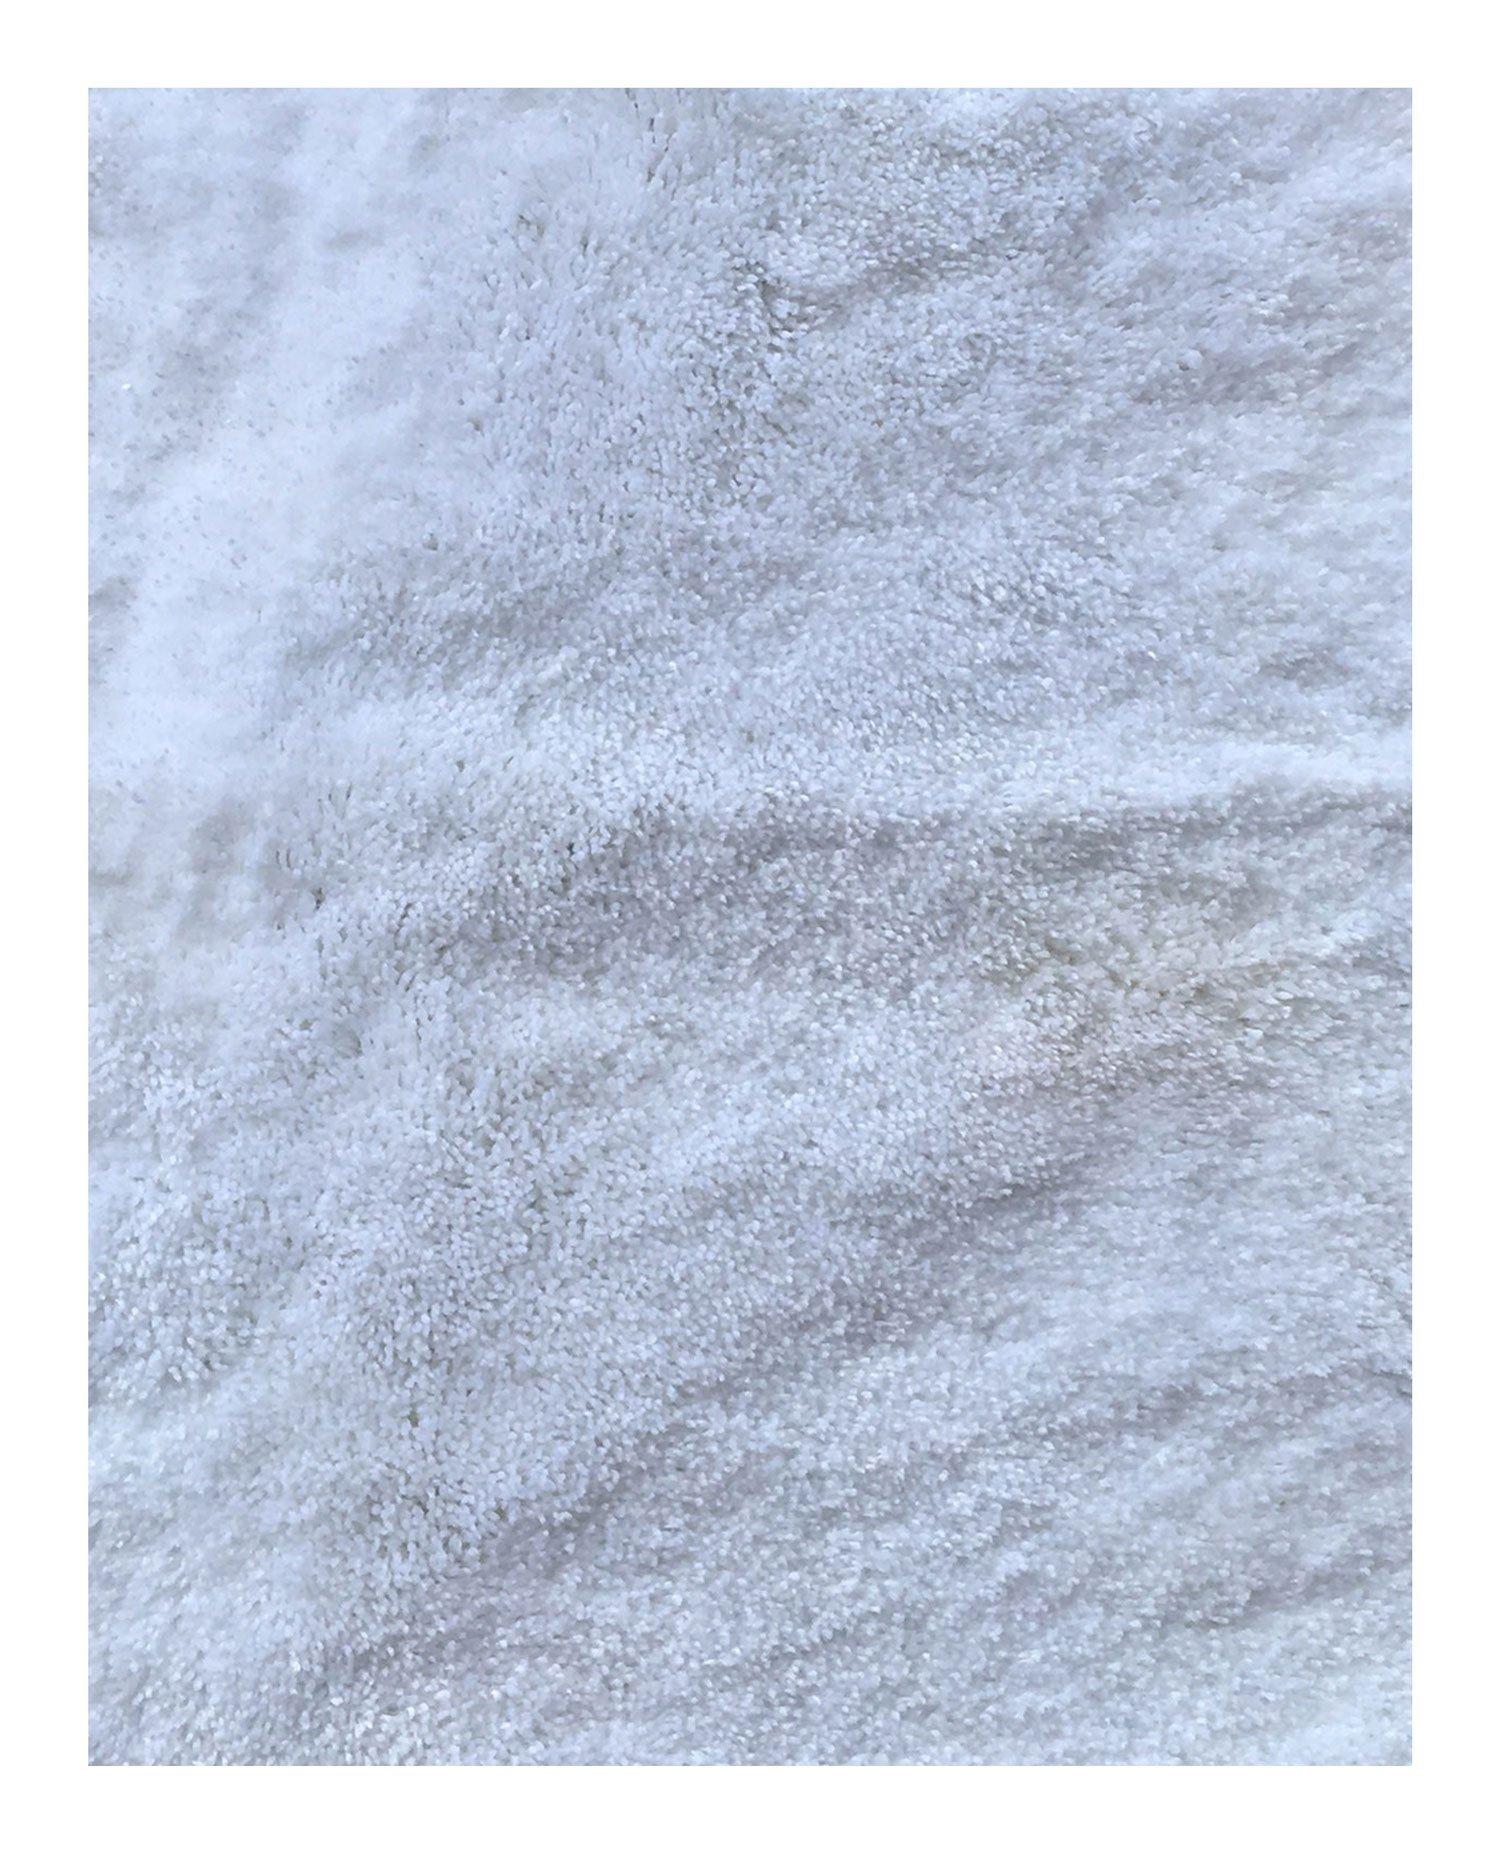 Mohawk Home Cut To Fit Royale Velvet Plush Bath Carpet, Bright White, 5 by 6 Feet